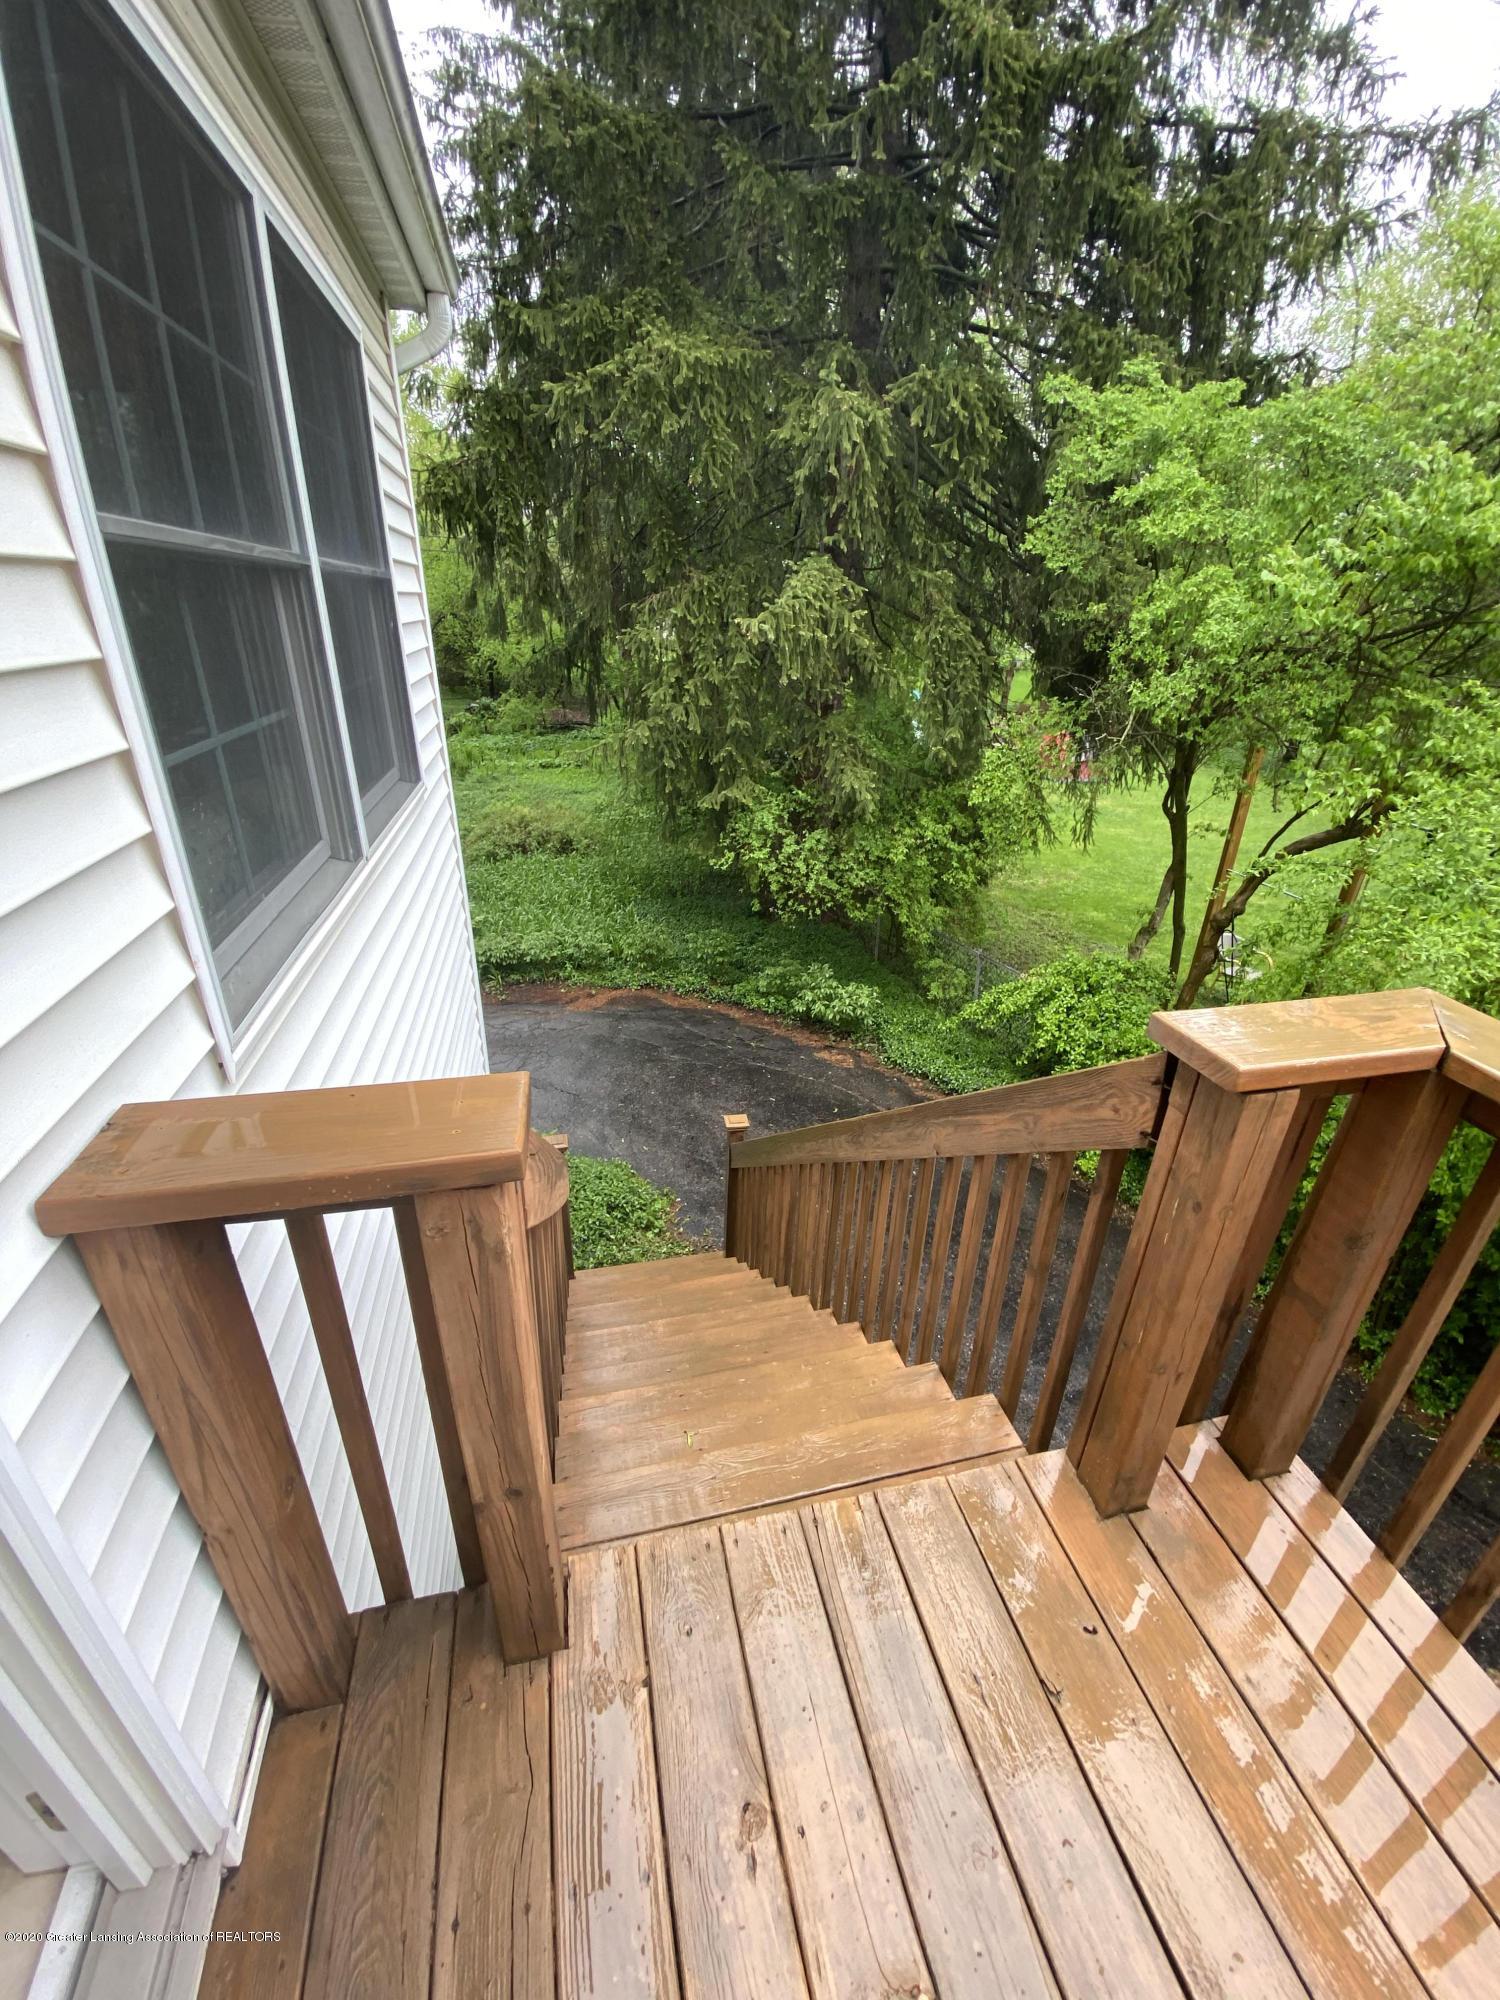 1010 N Harrison Rd - deck to backyard - 3